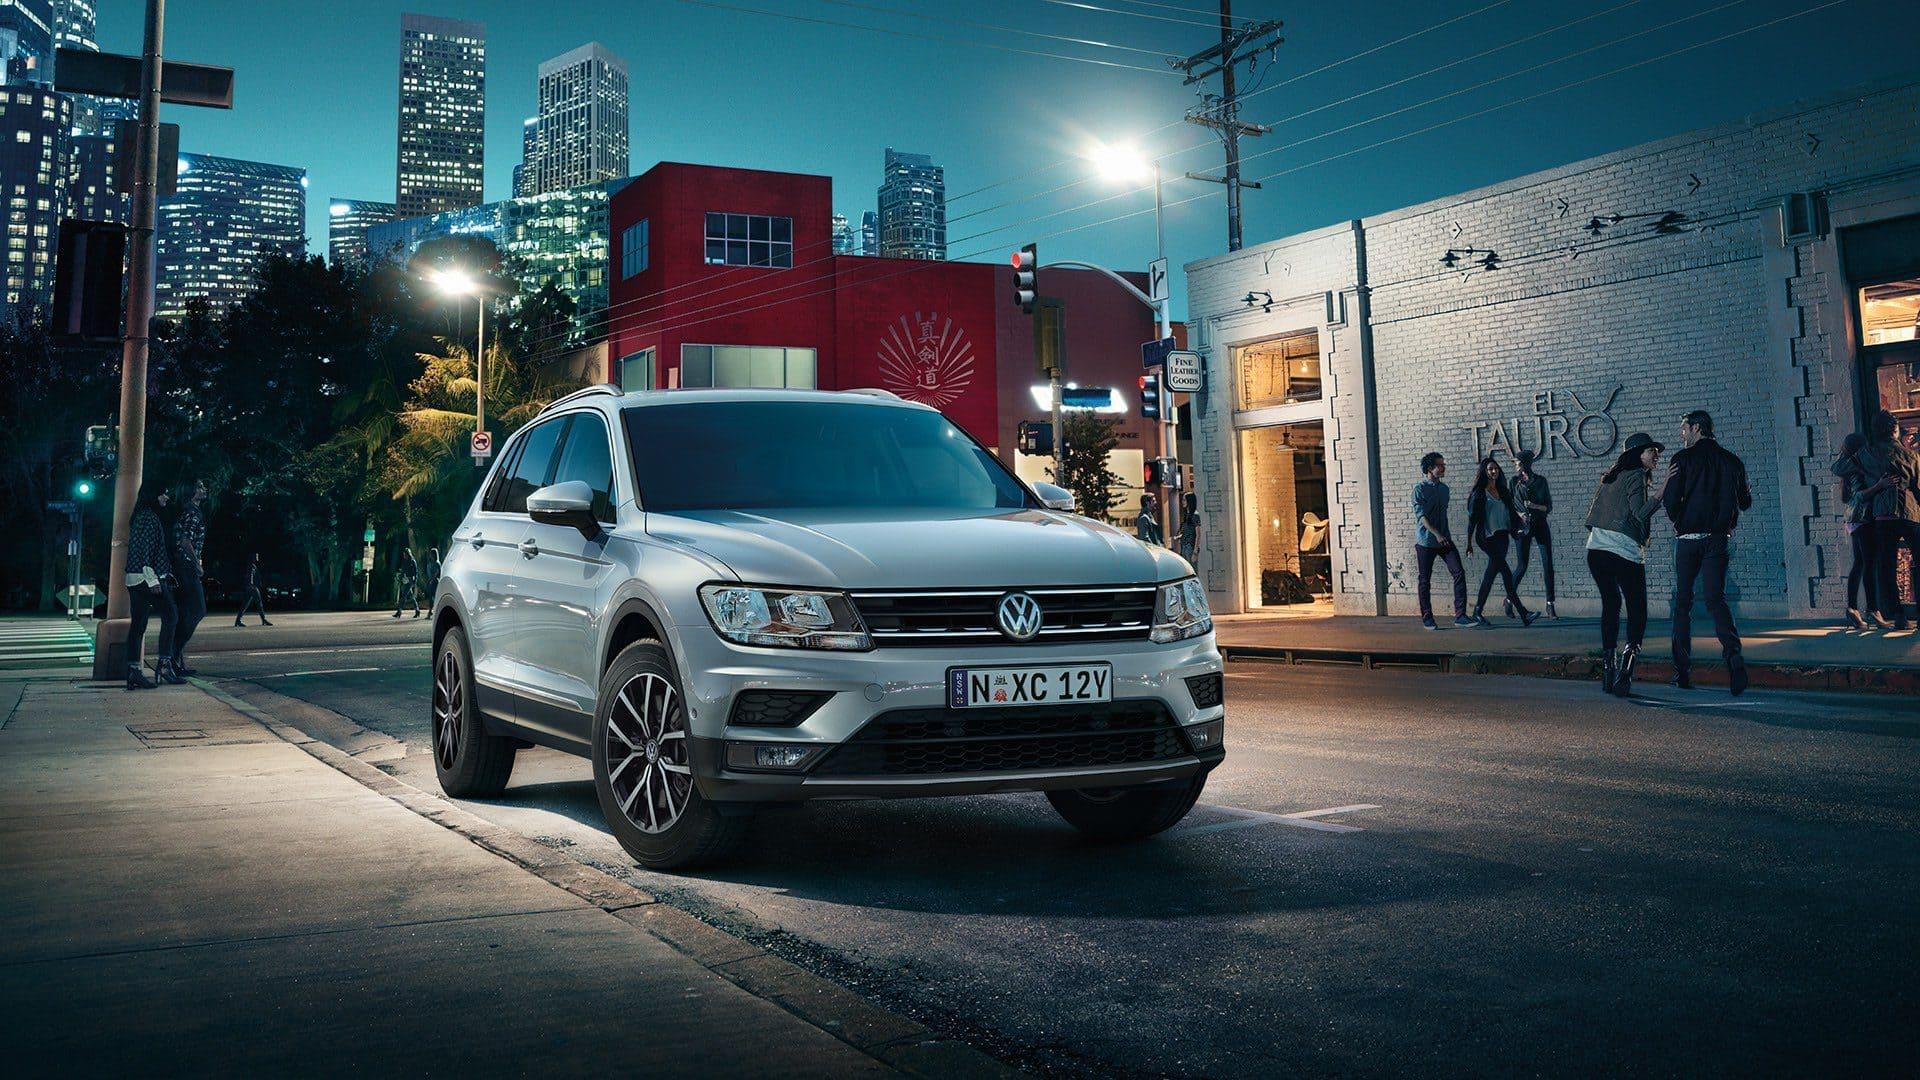 Tiguan Bill Buckle Volkswagen Fuel Filter A Class Of Its Own Again